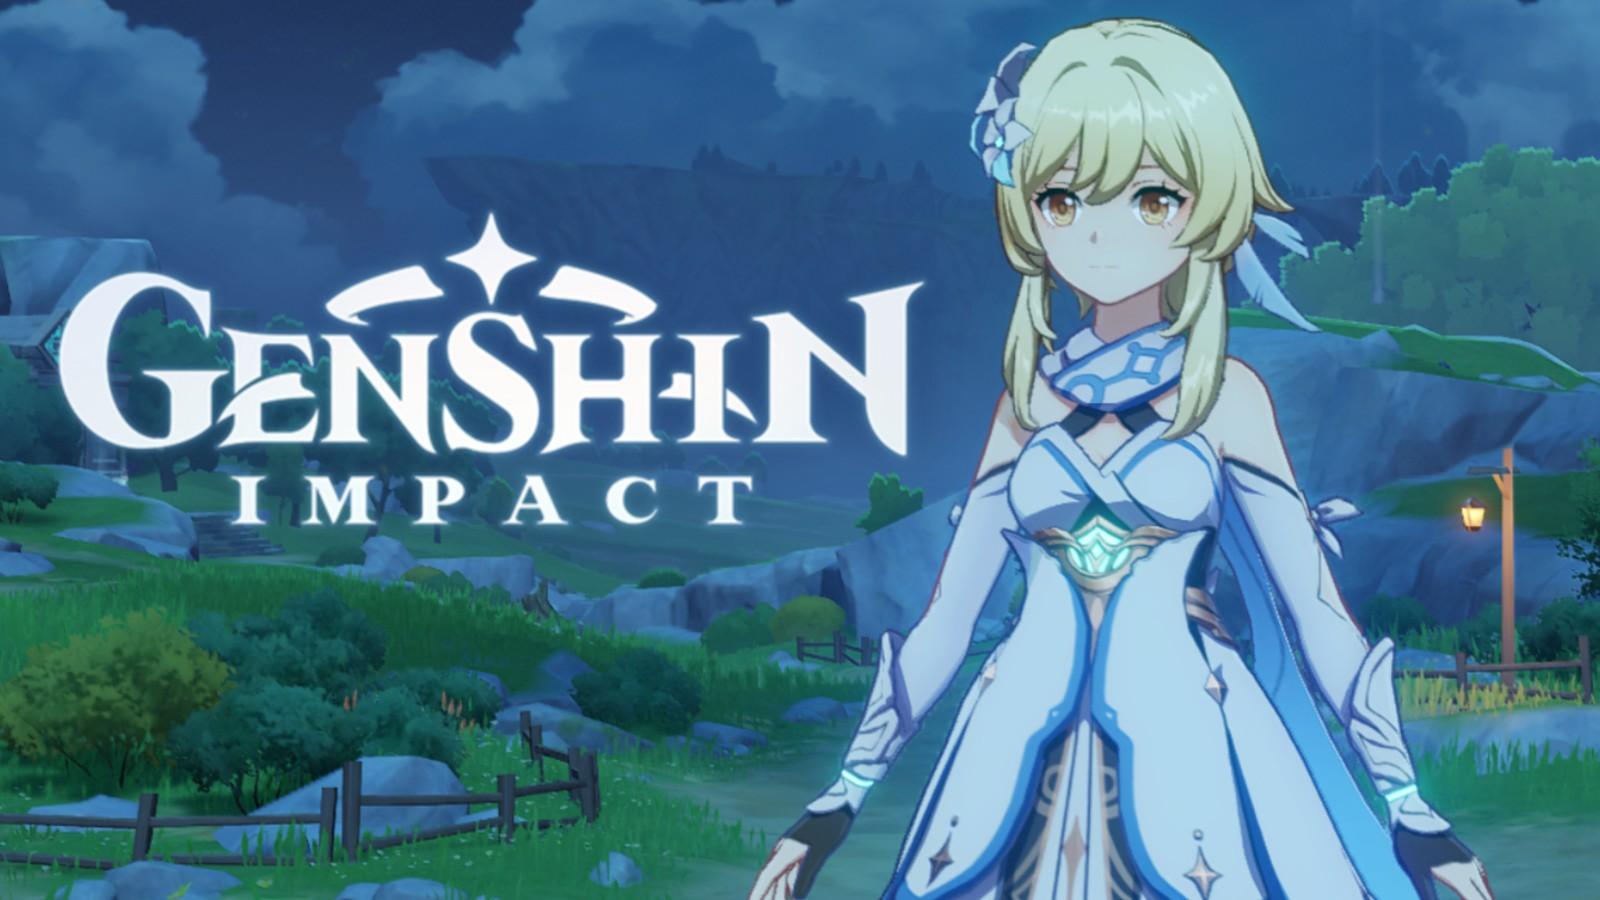 Genshin Impact character by the logo